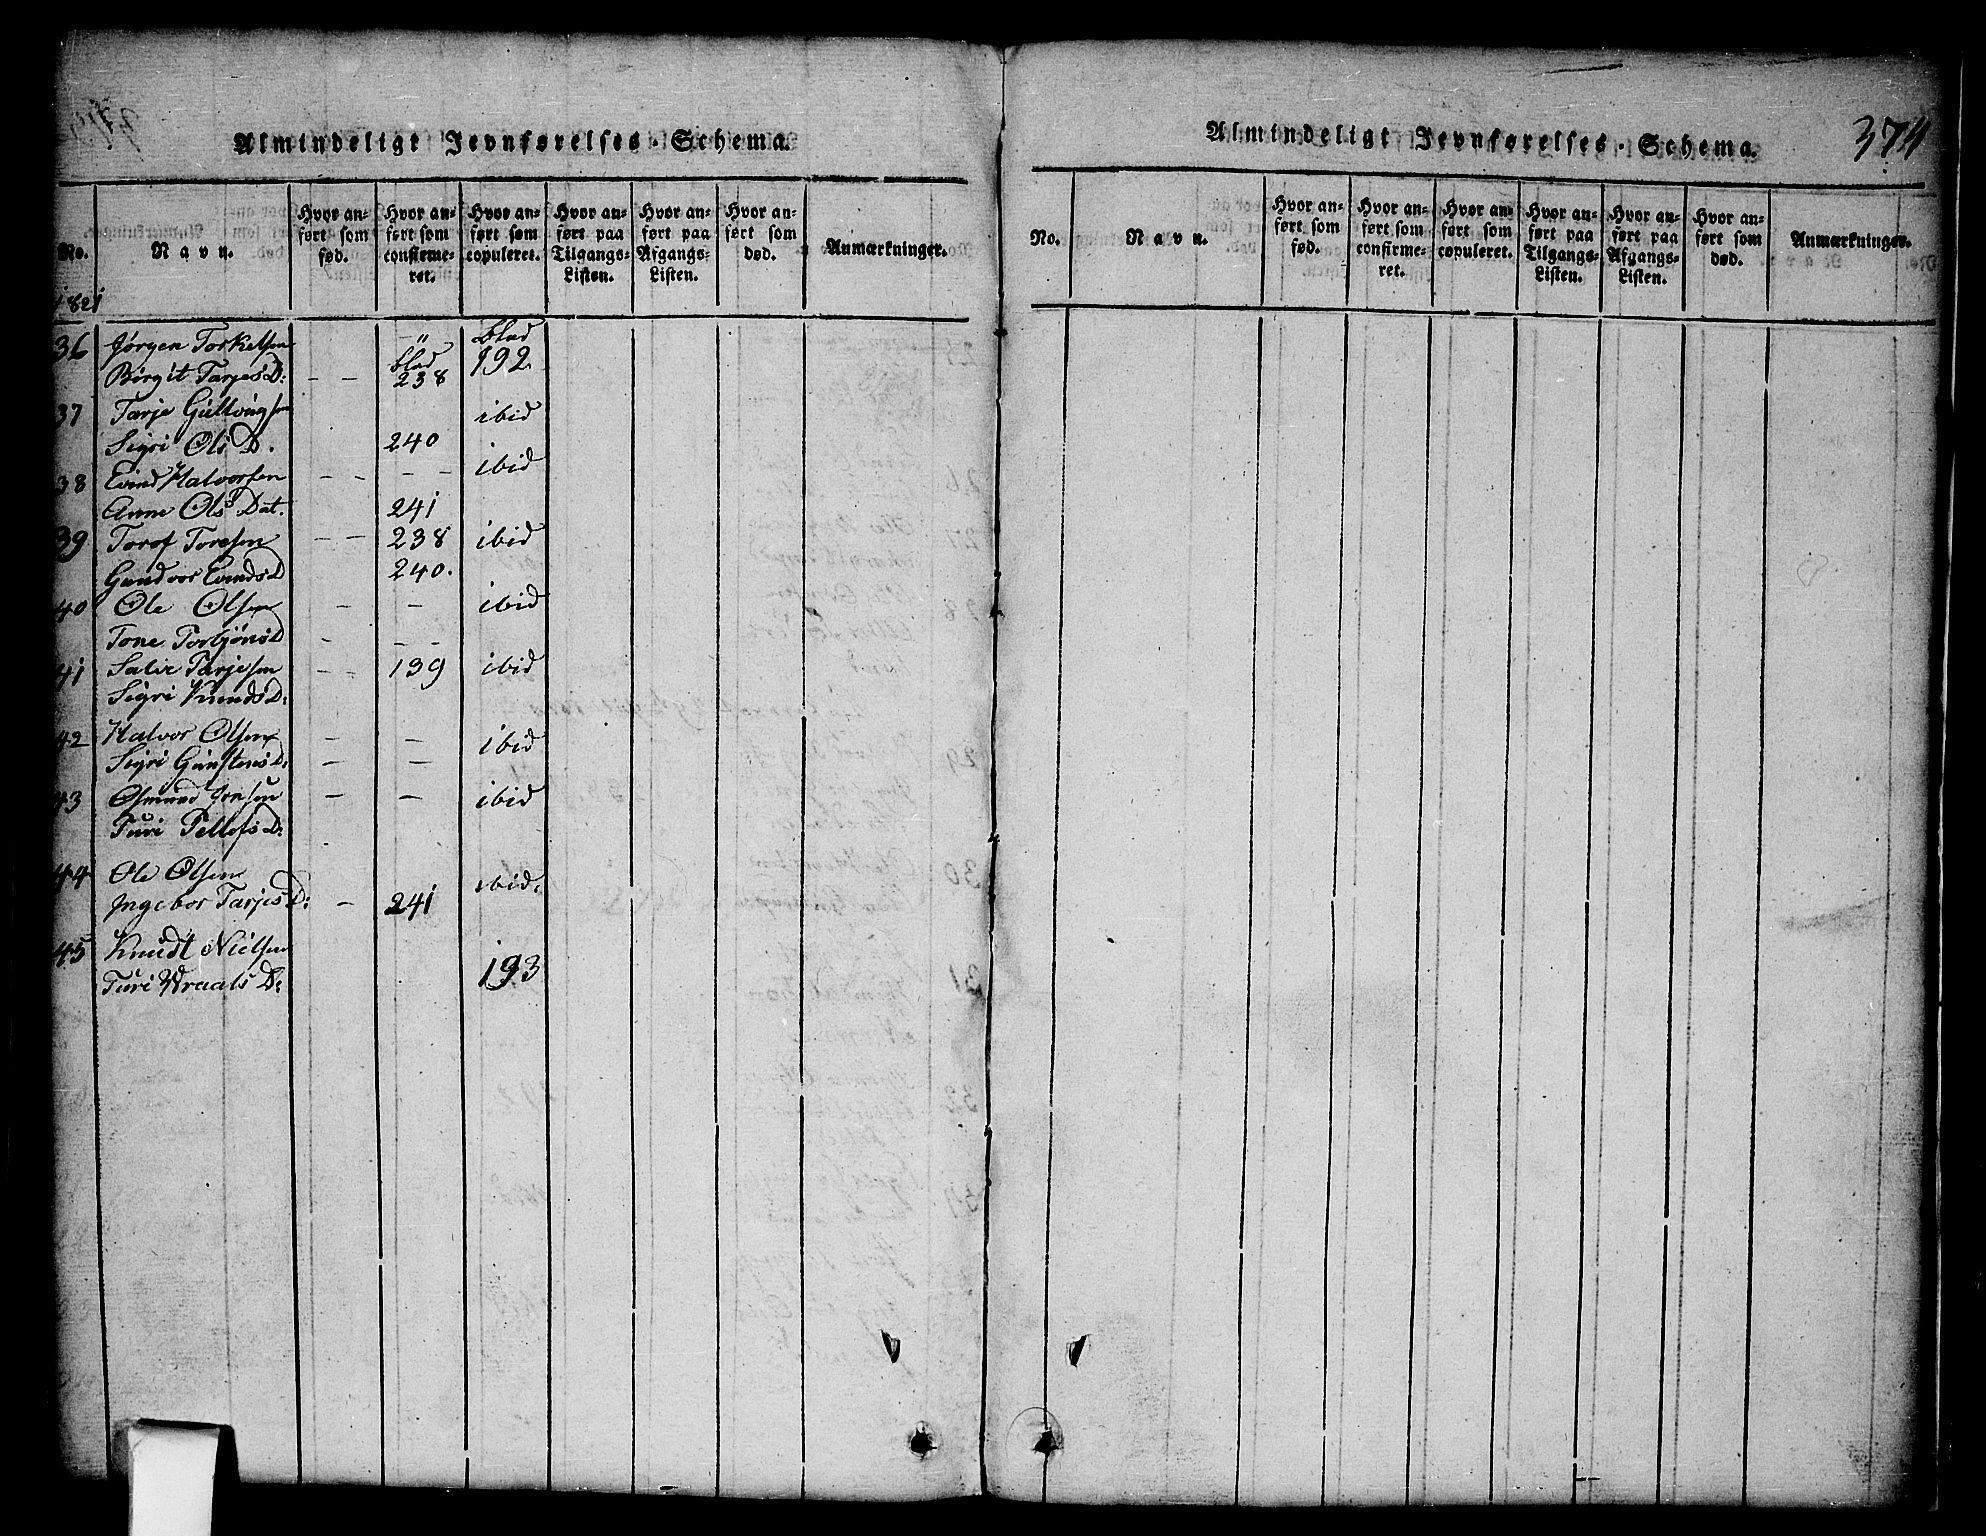 SAKO, Nissedal kirkebøker, G/Gb/L0001: Klokkerbok nr. II 1, 1814-1862, s. 374